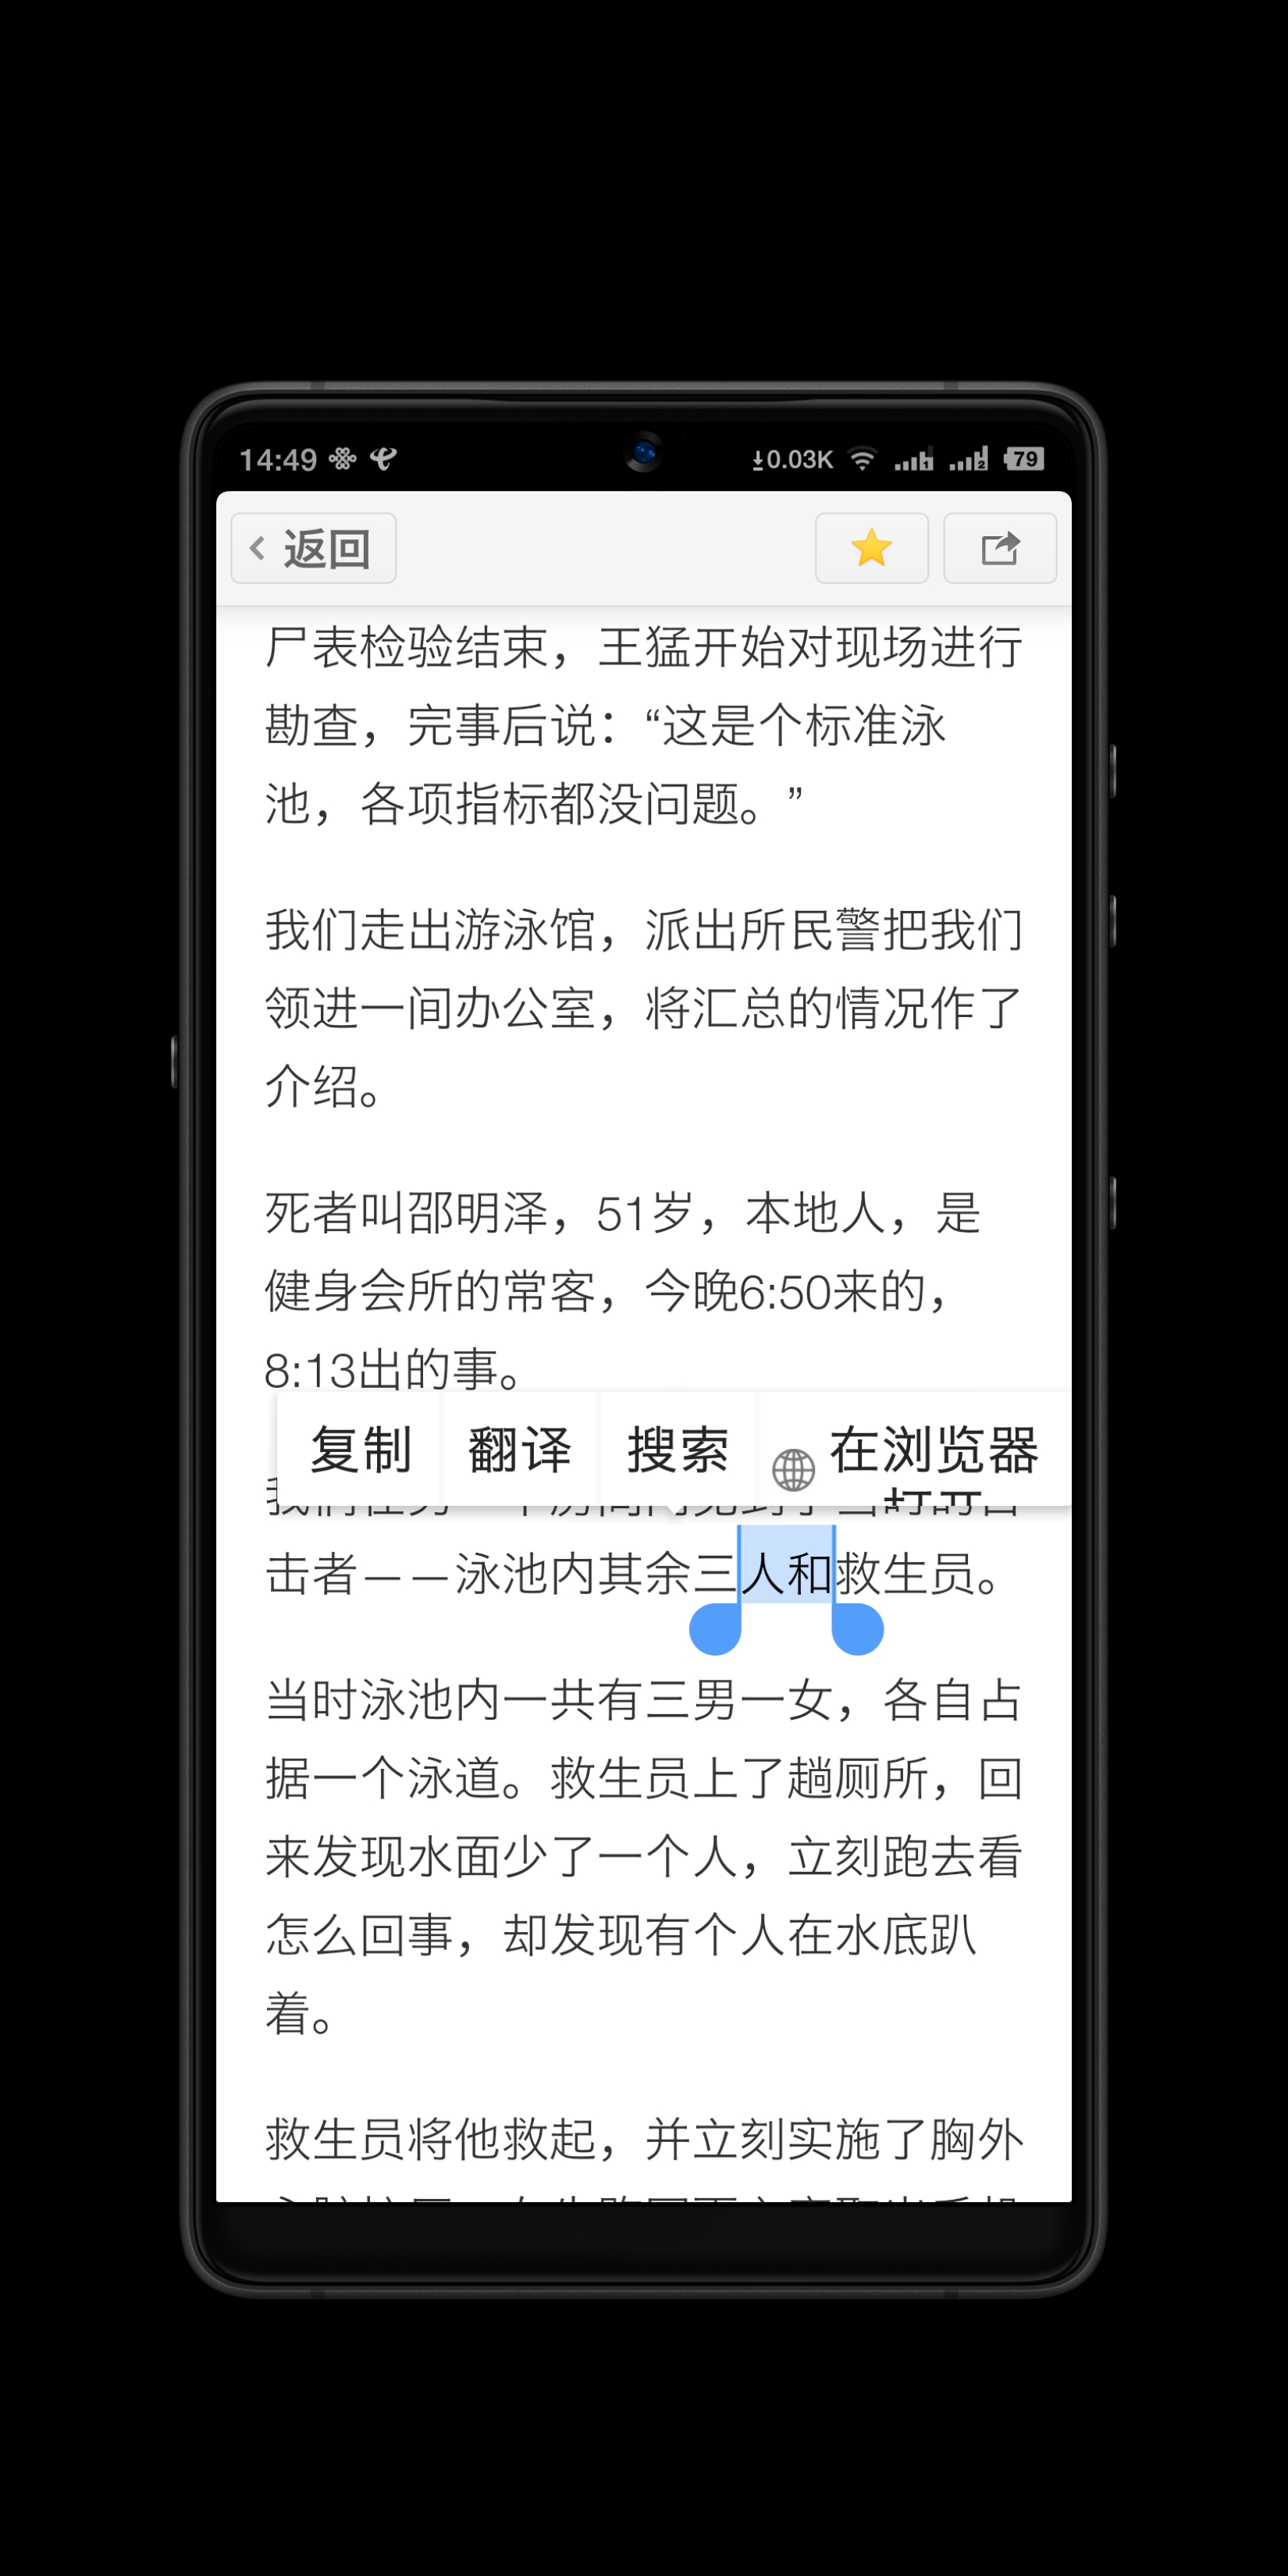 Screenshot_2019-08-04-14-49-05-854_????.png